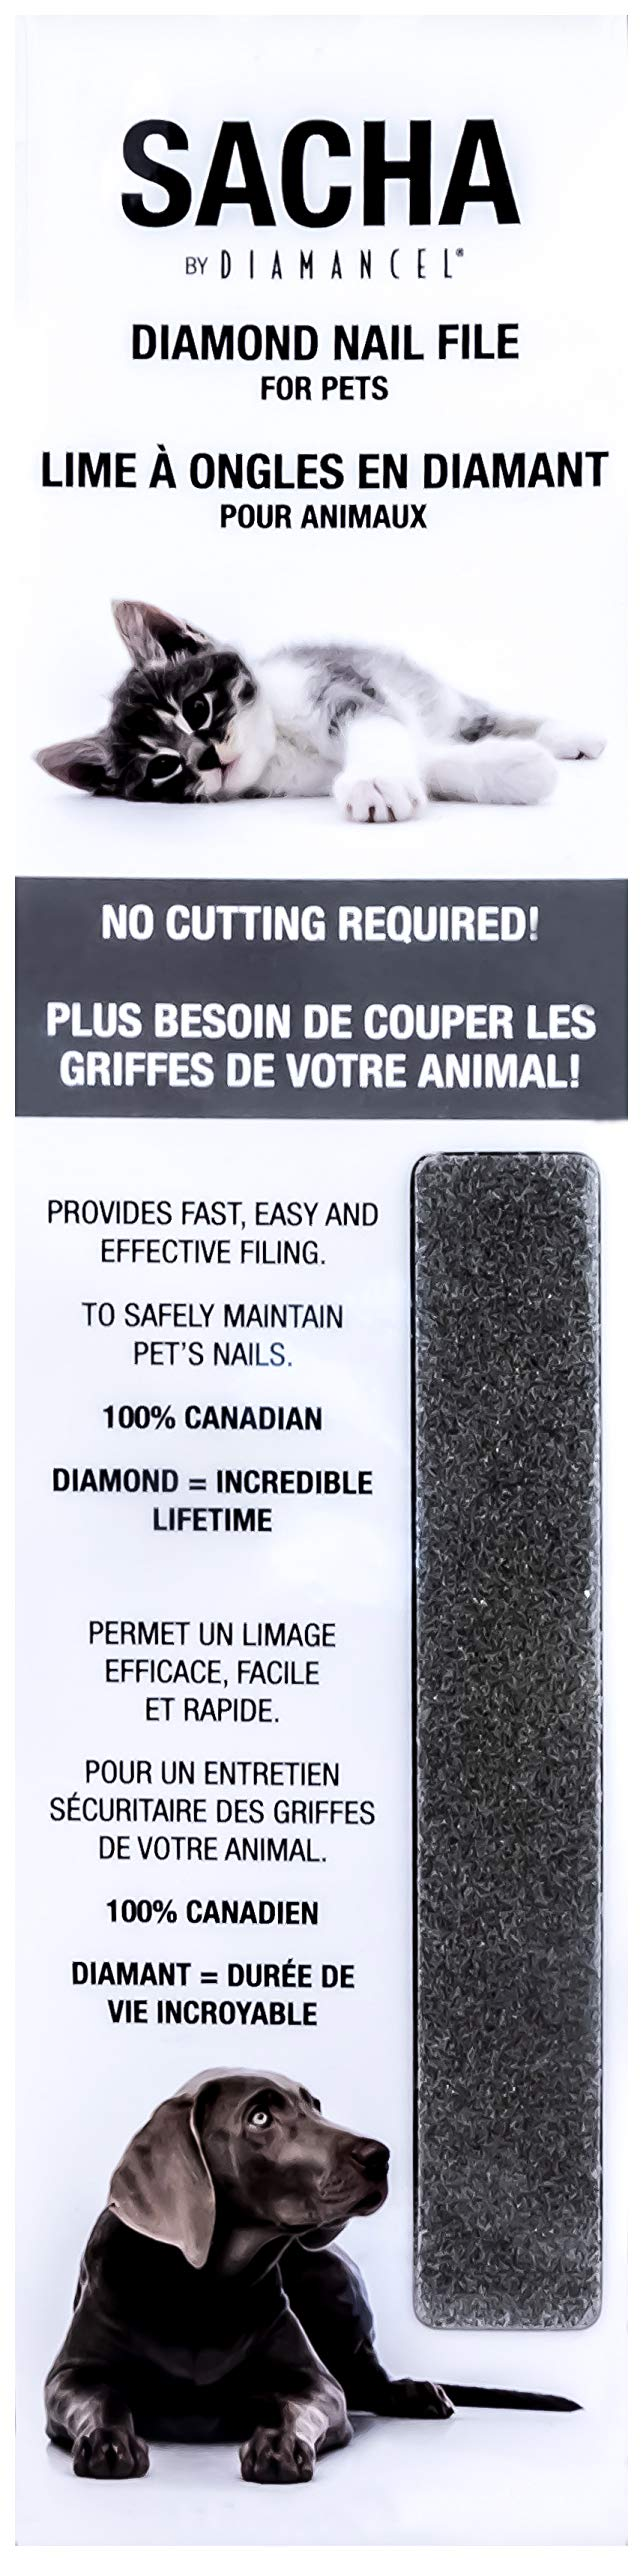 Diamancel - Sacha Nail File for Pets - for Regular Maintenance of Your Pet's Nails Between Groomings